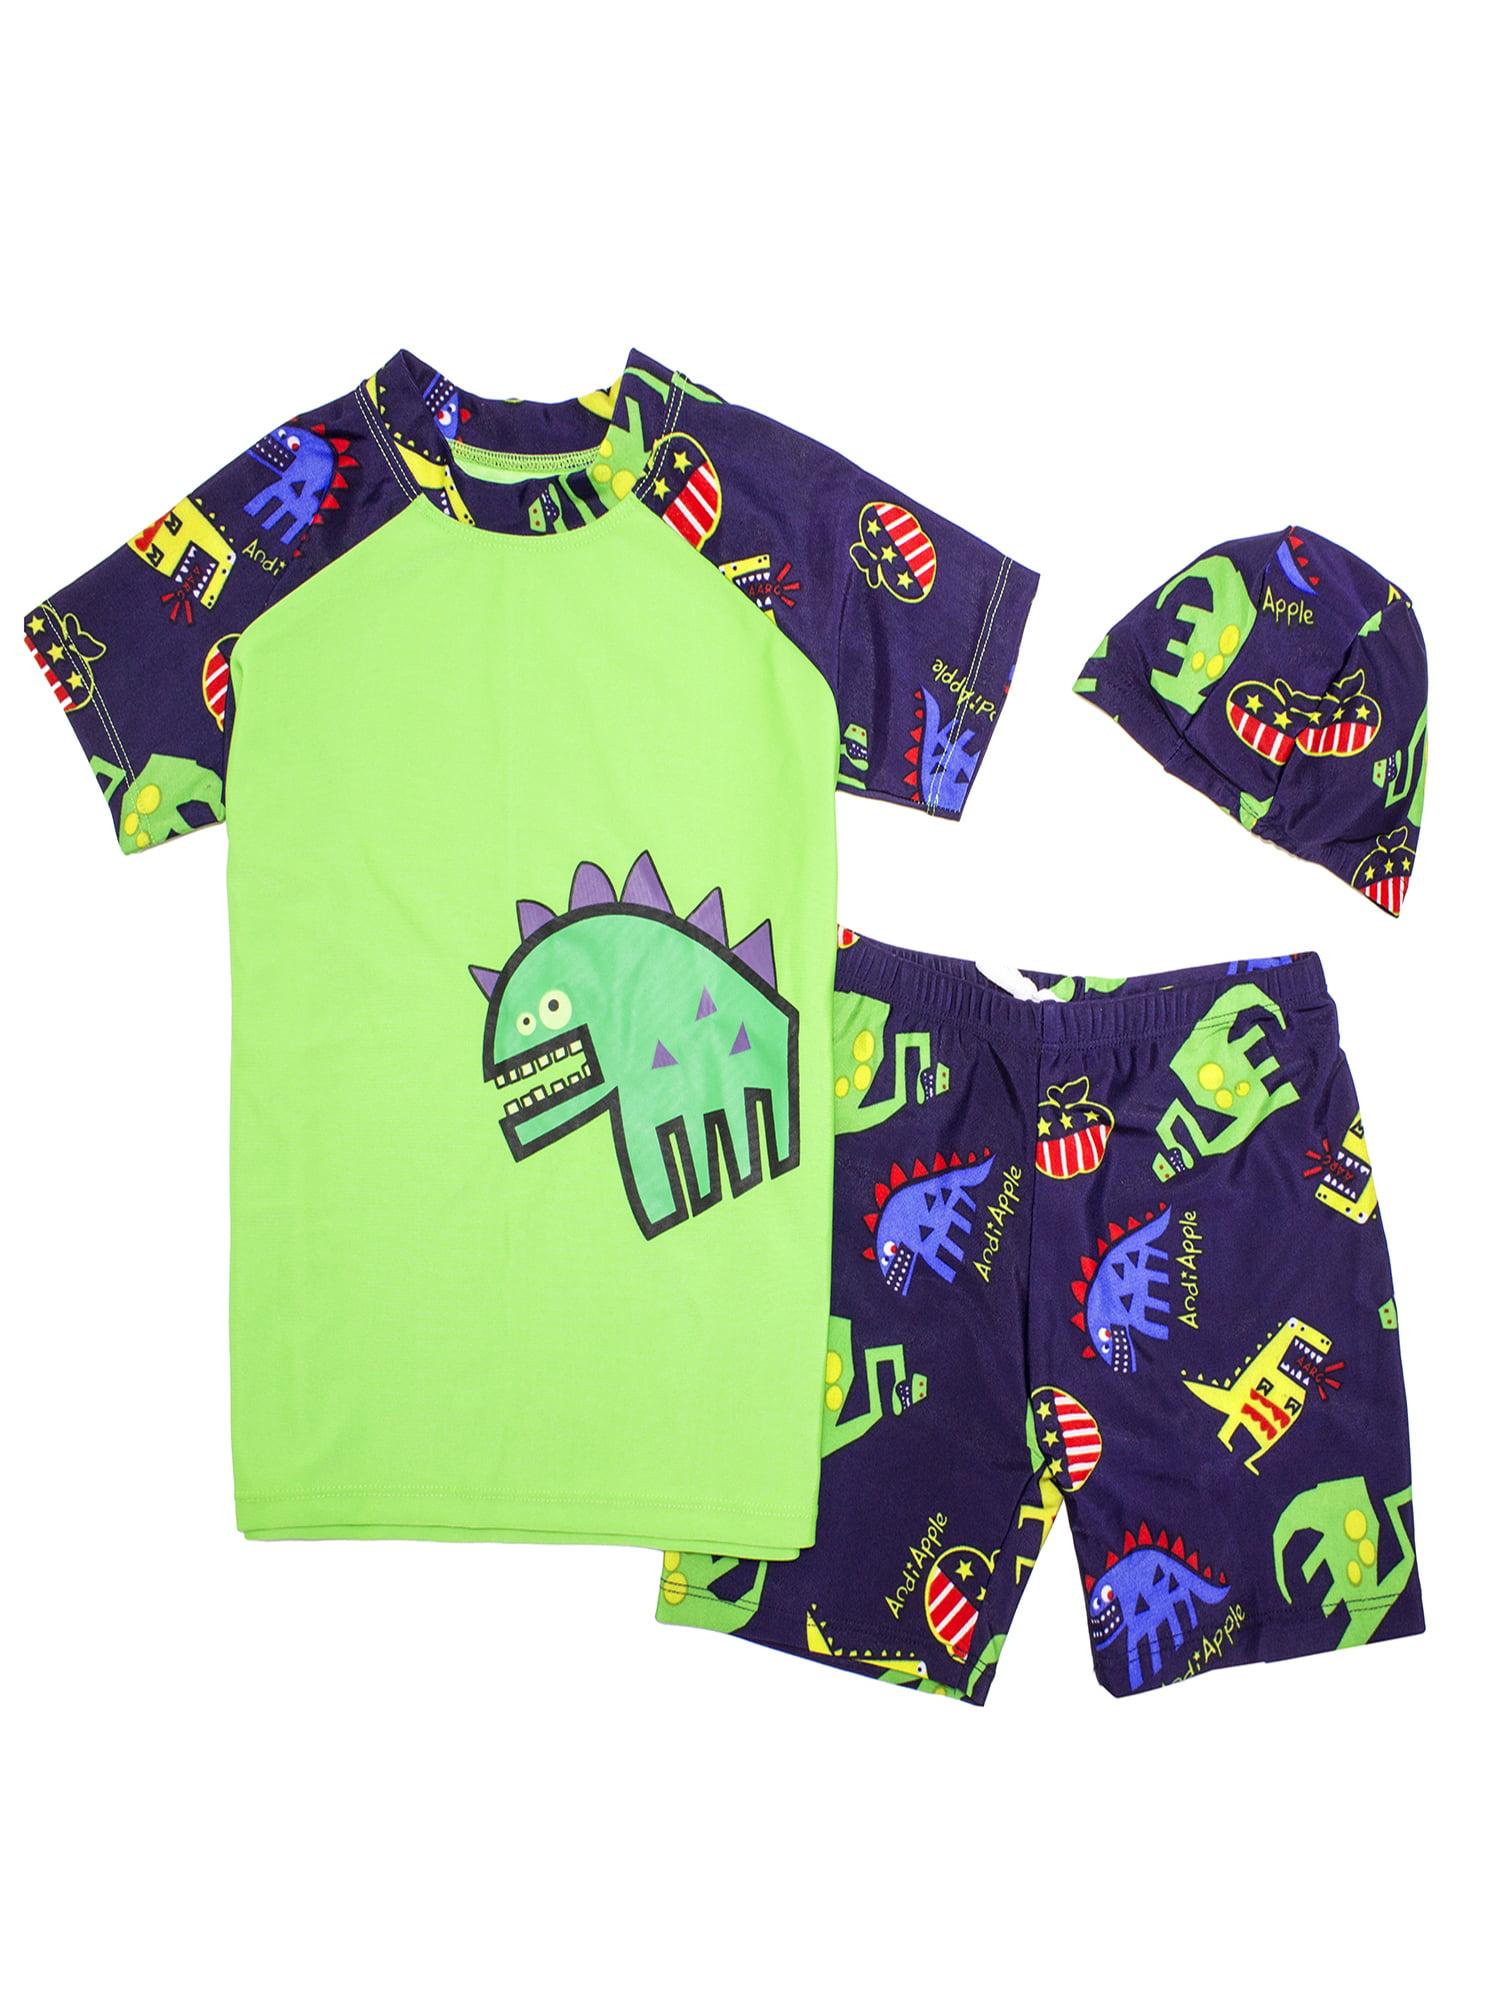 a7ed885cfc StylesILove - Kids Boy Cartoon Dinosaur Shark Rashguard Top & Swim Shorts  with Hat 3 pcs Set (Green Dinosaur/Yellow, 3XL/11-13 Years) - Walmart.com